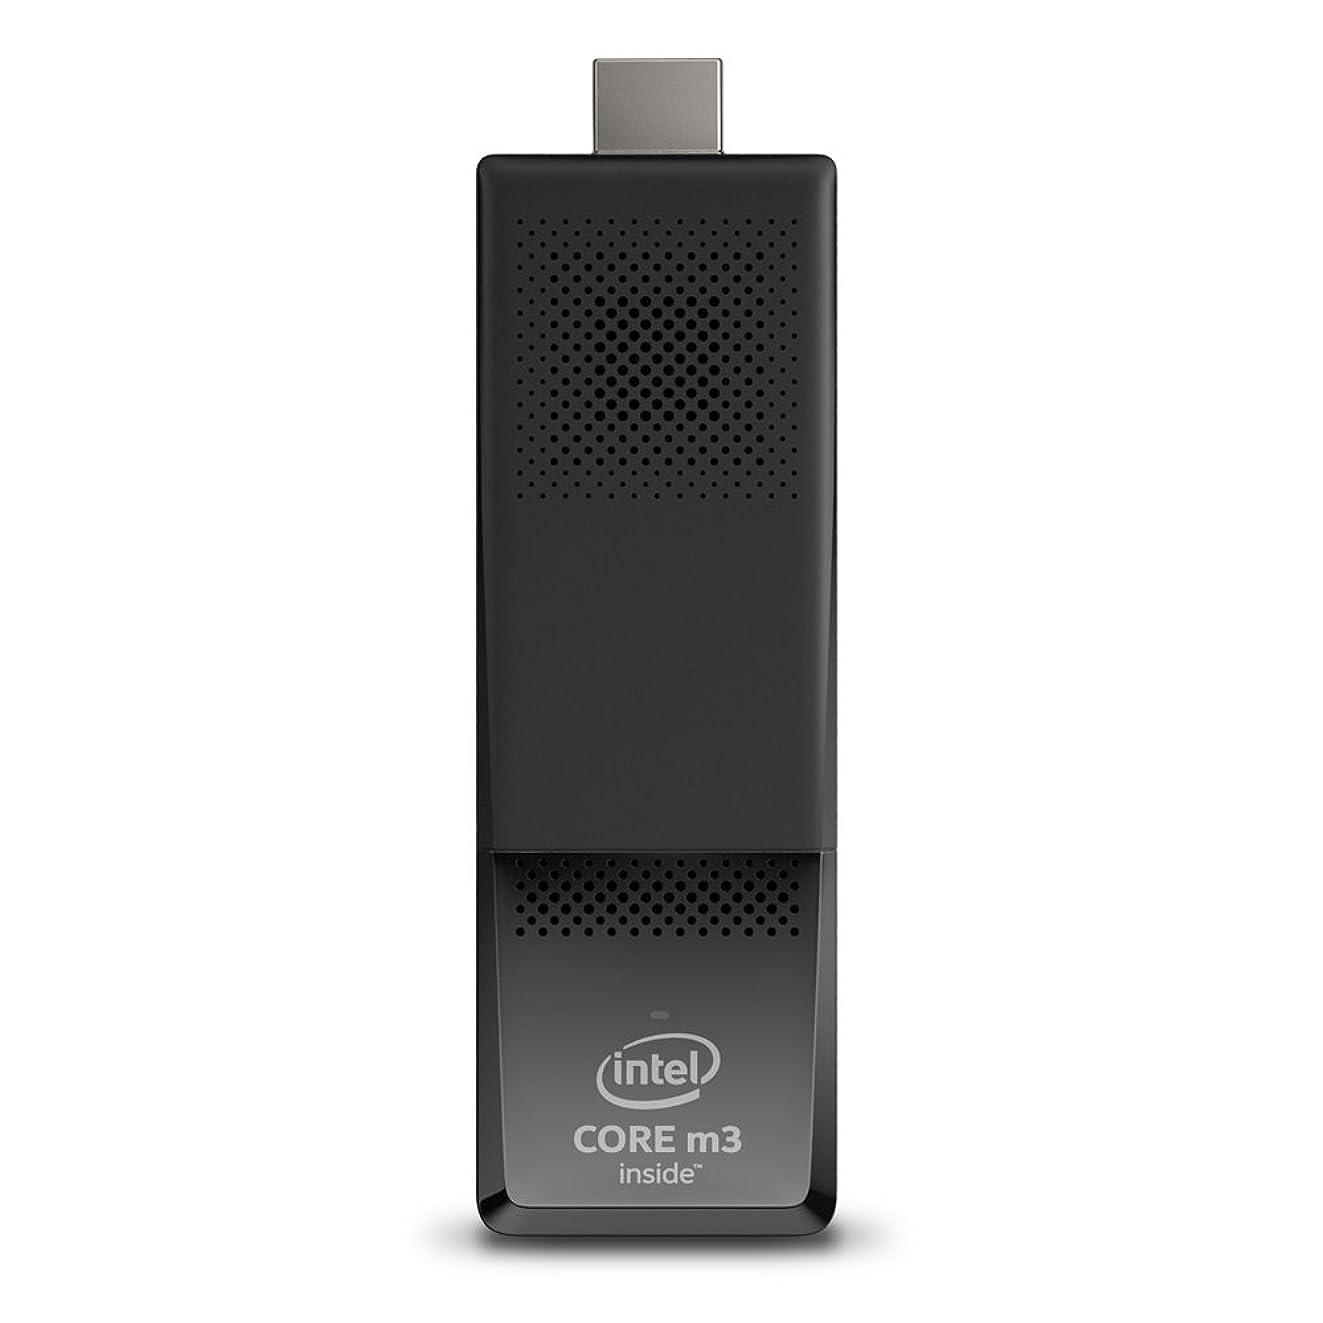 Intel Compute Stick CS325 Computer with Intel Core m3 processor (BOXSTK2m3W64CC)